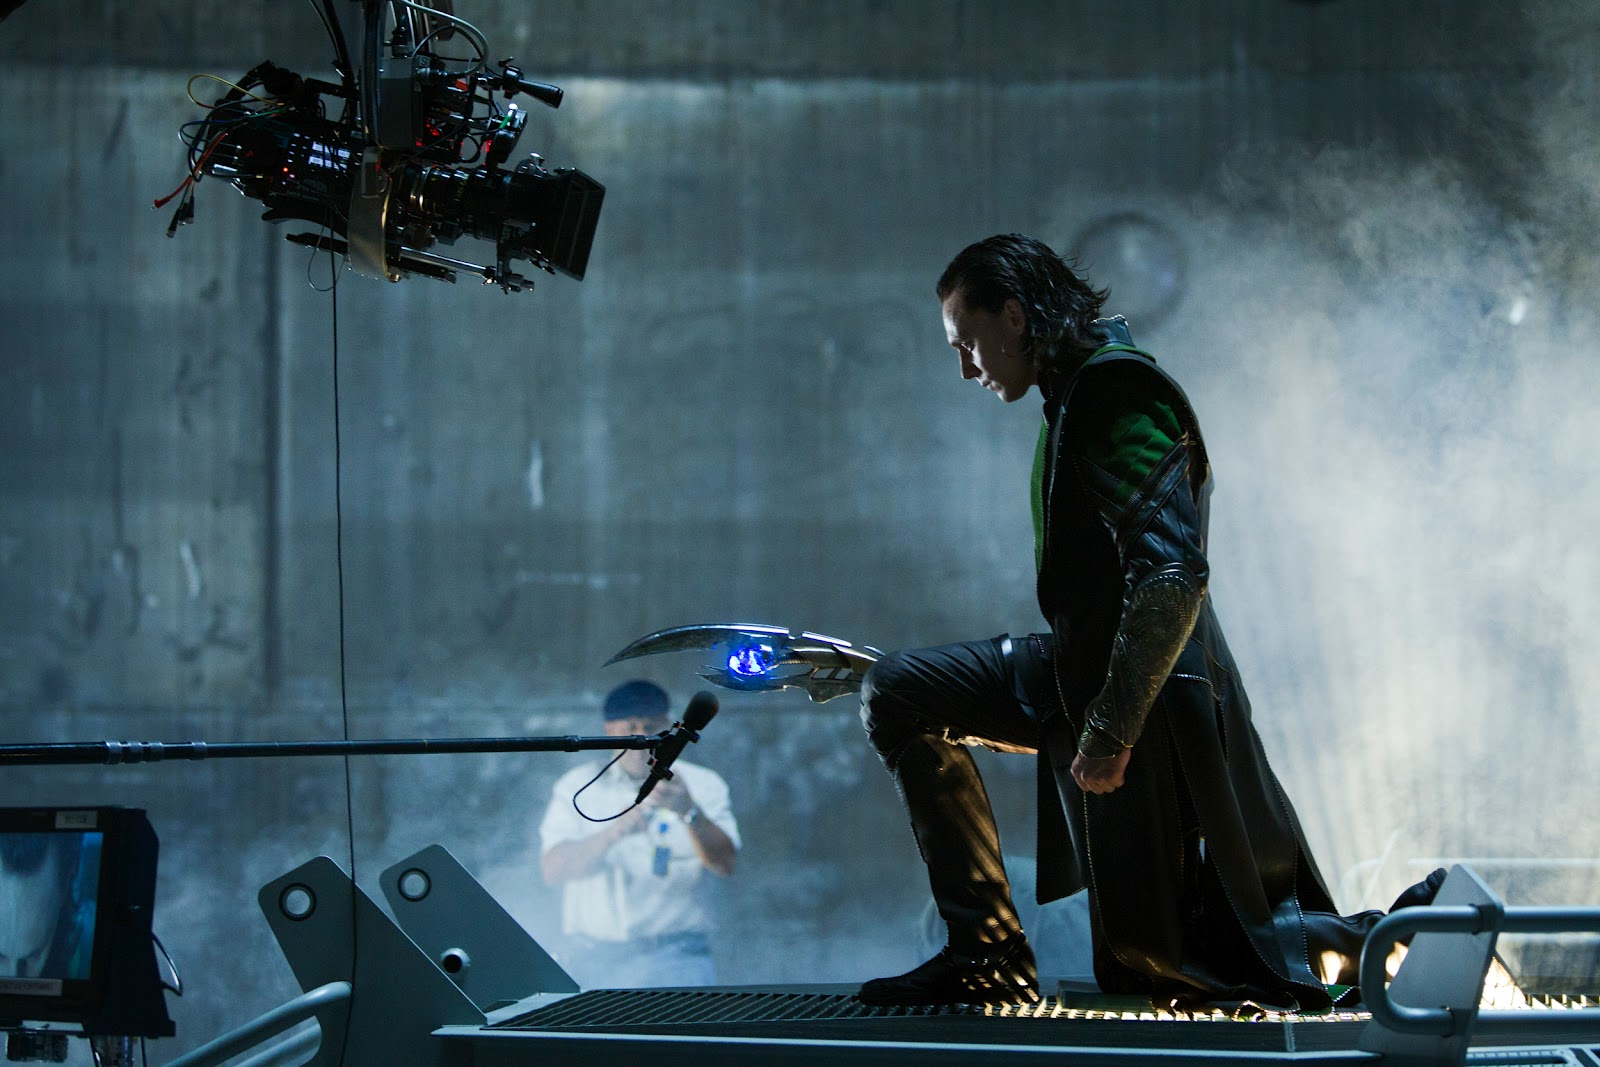 The Avengers: MOVIE HYPE SA: THOR 2 (News Update